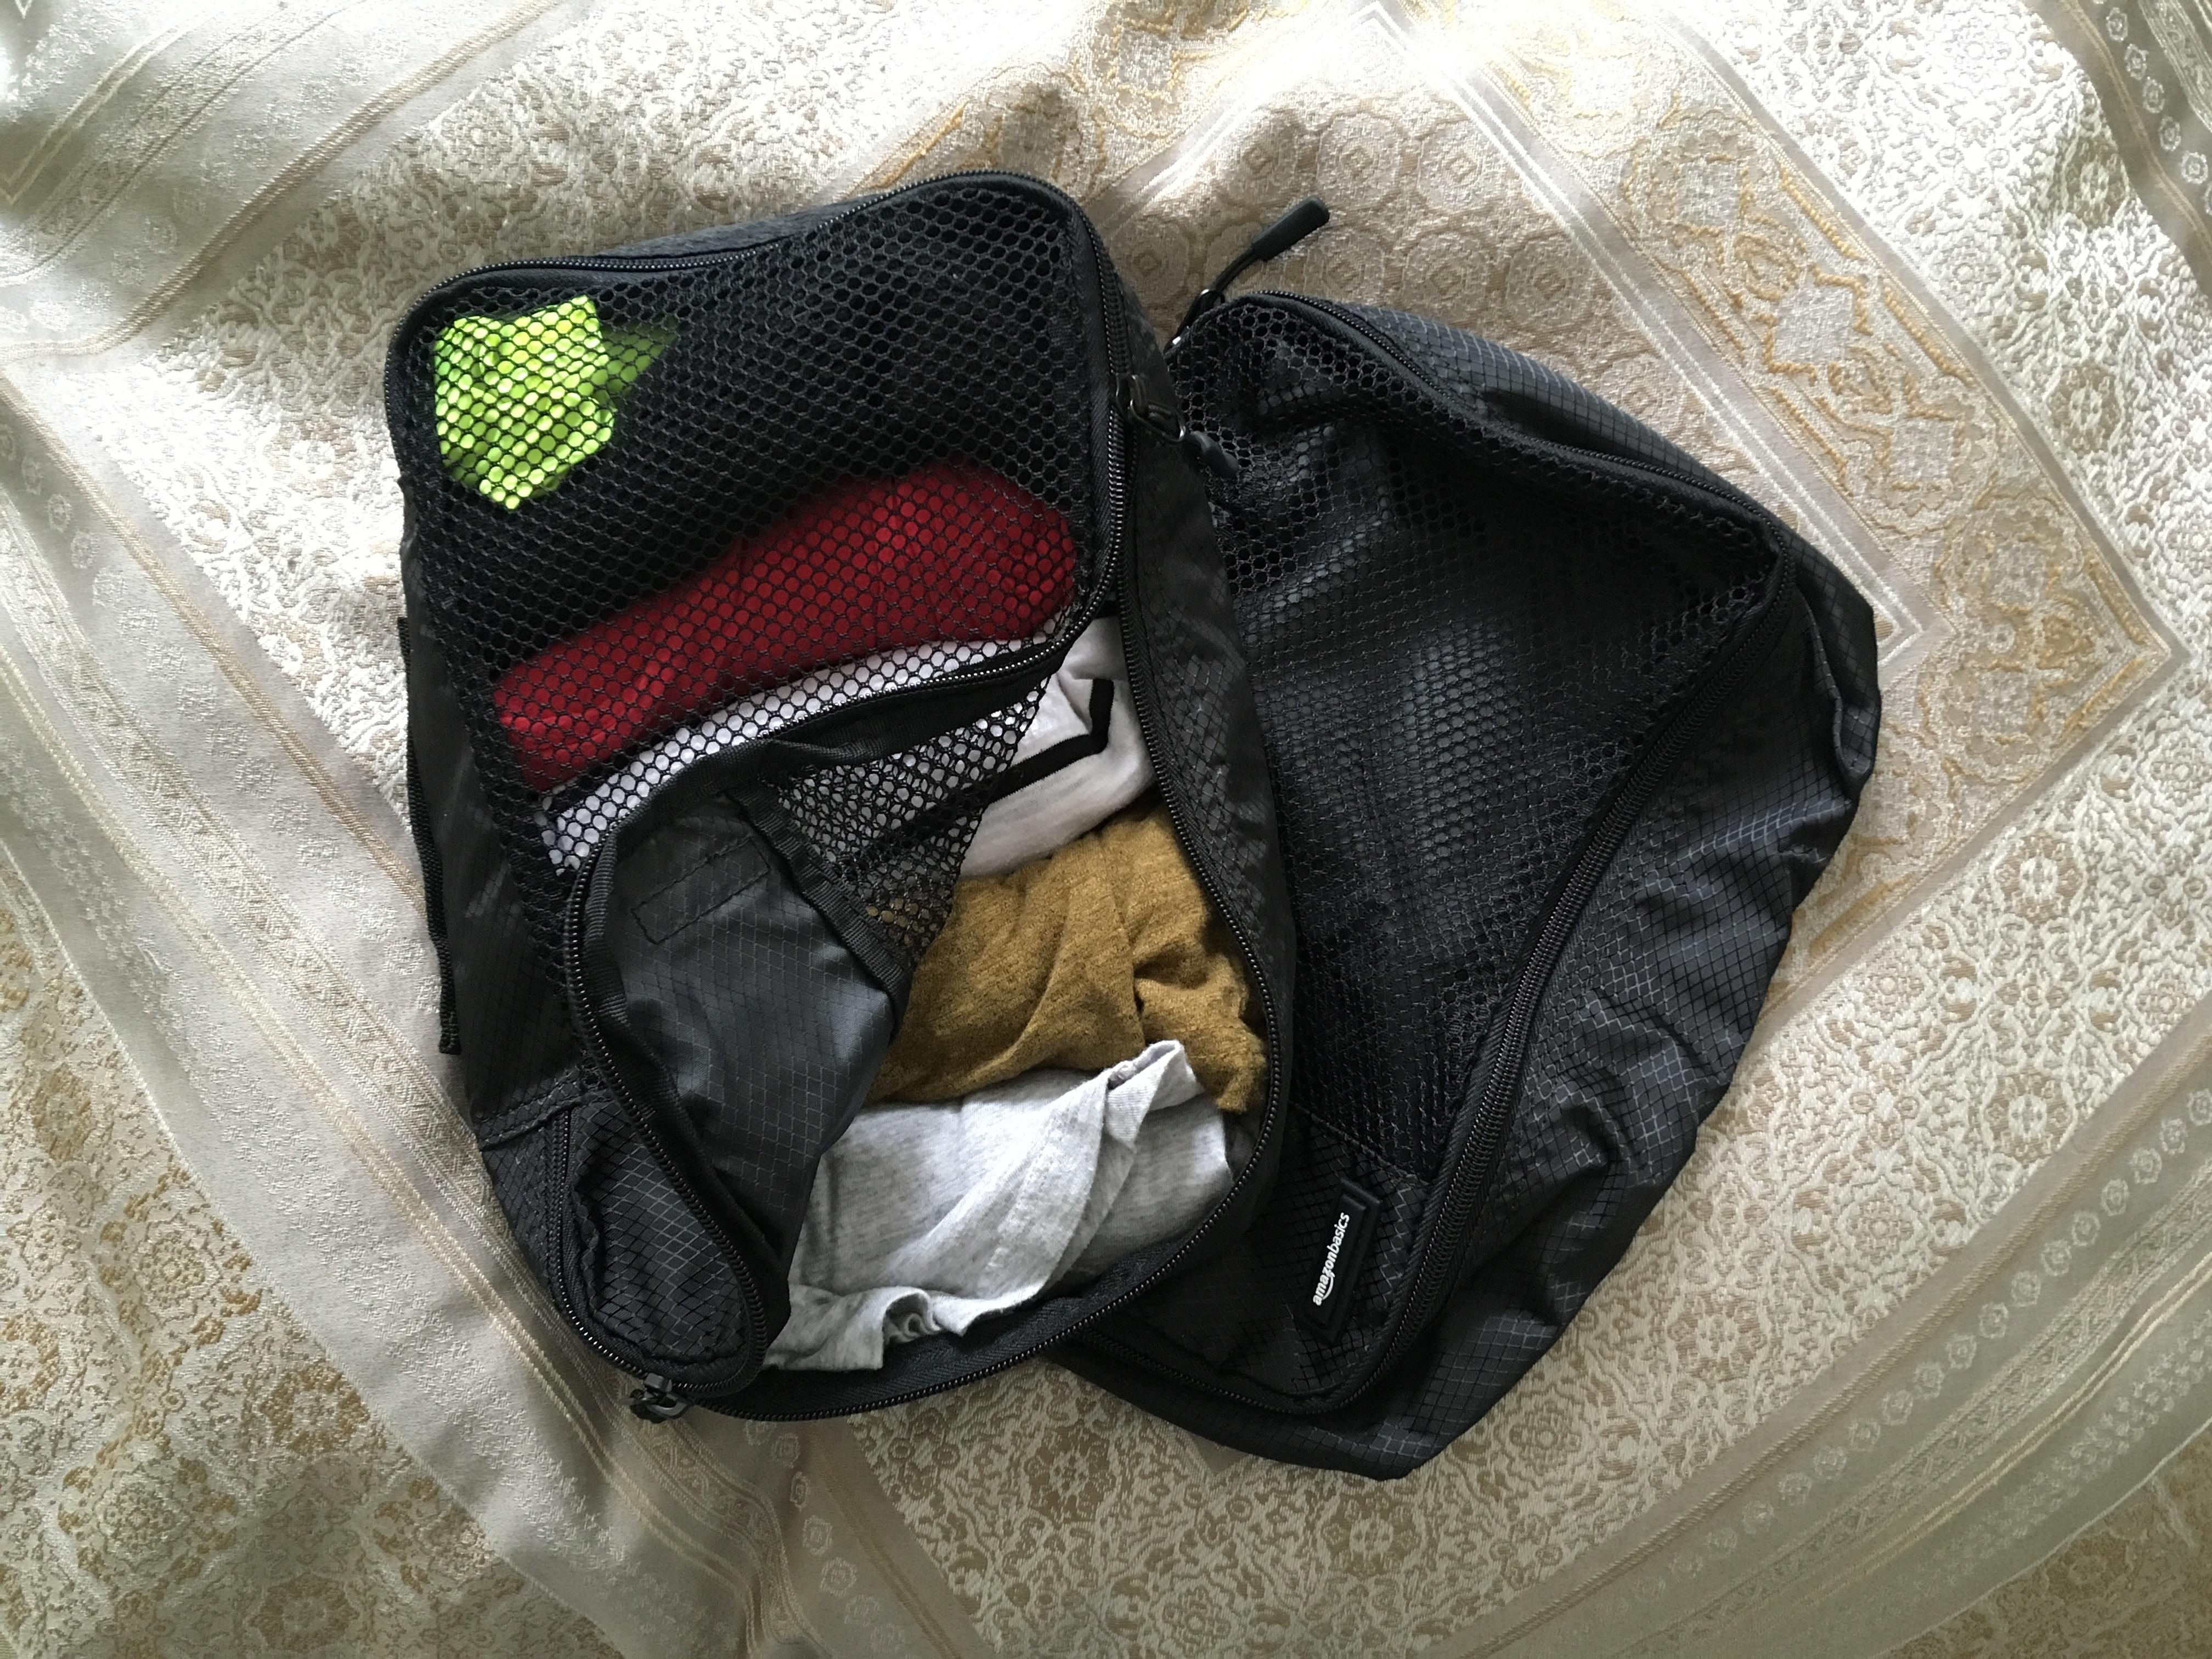 packing cubes, accessoire voyage, article voyage